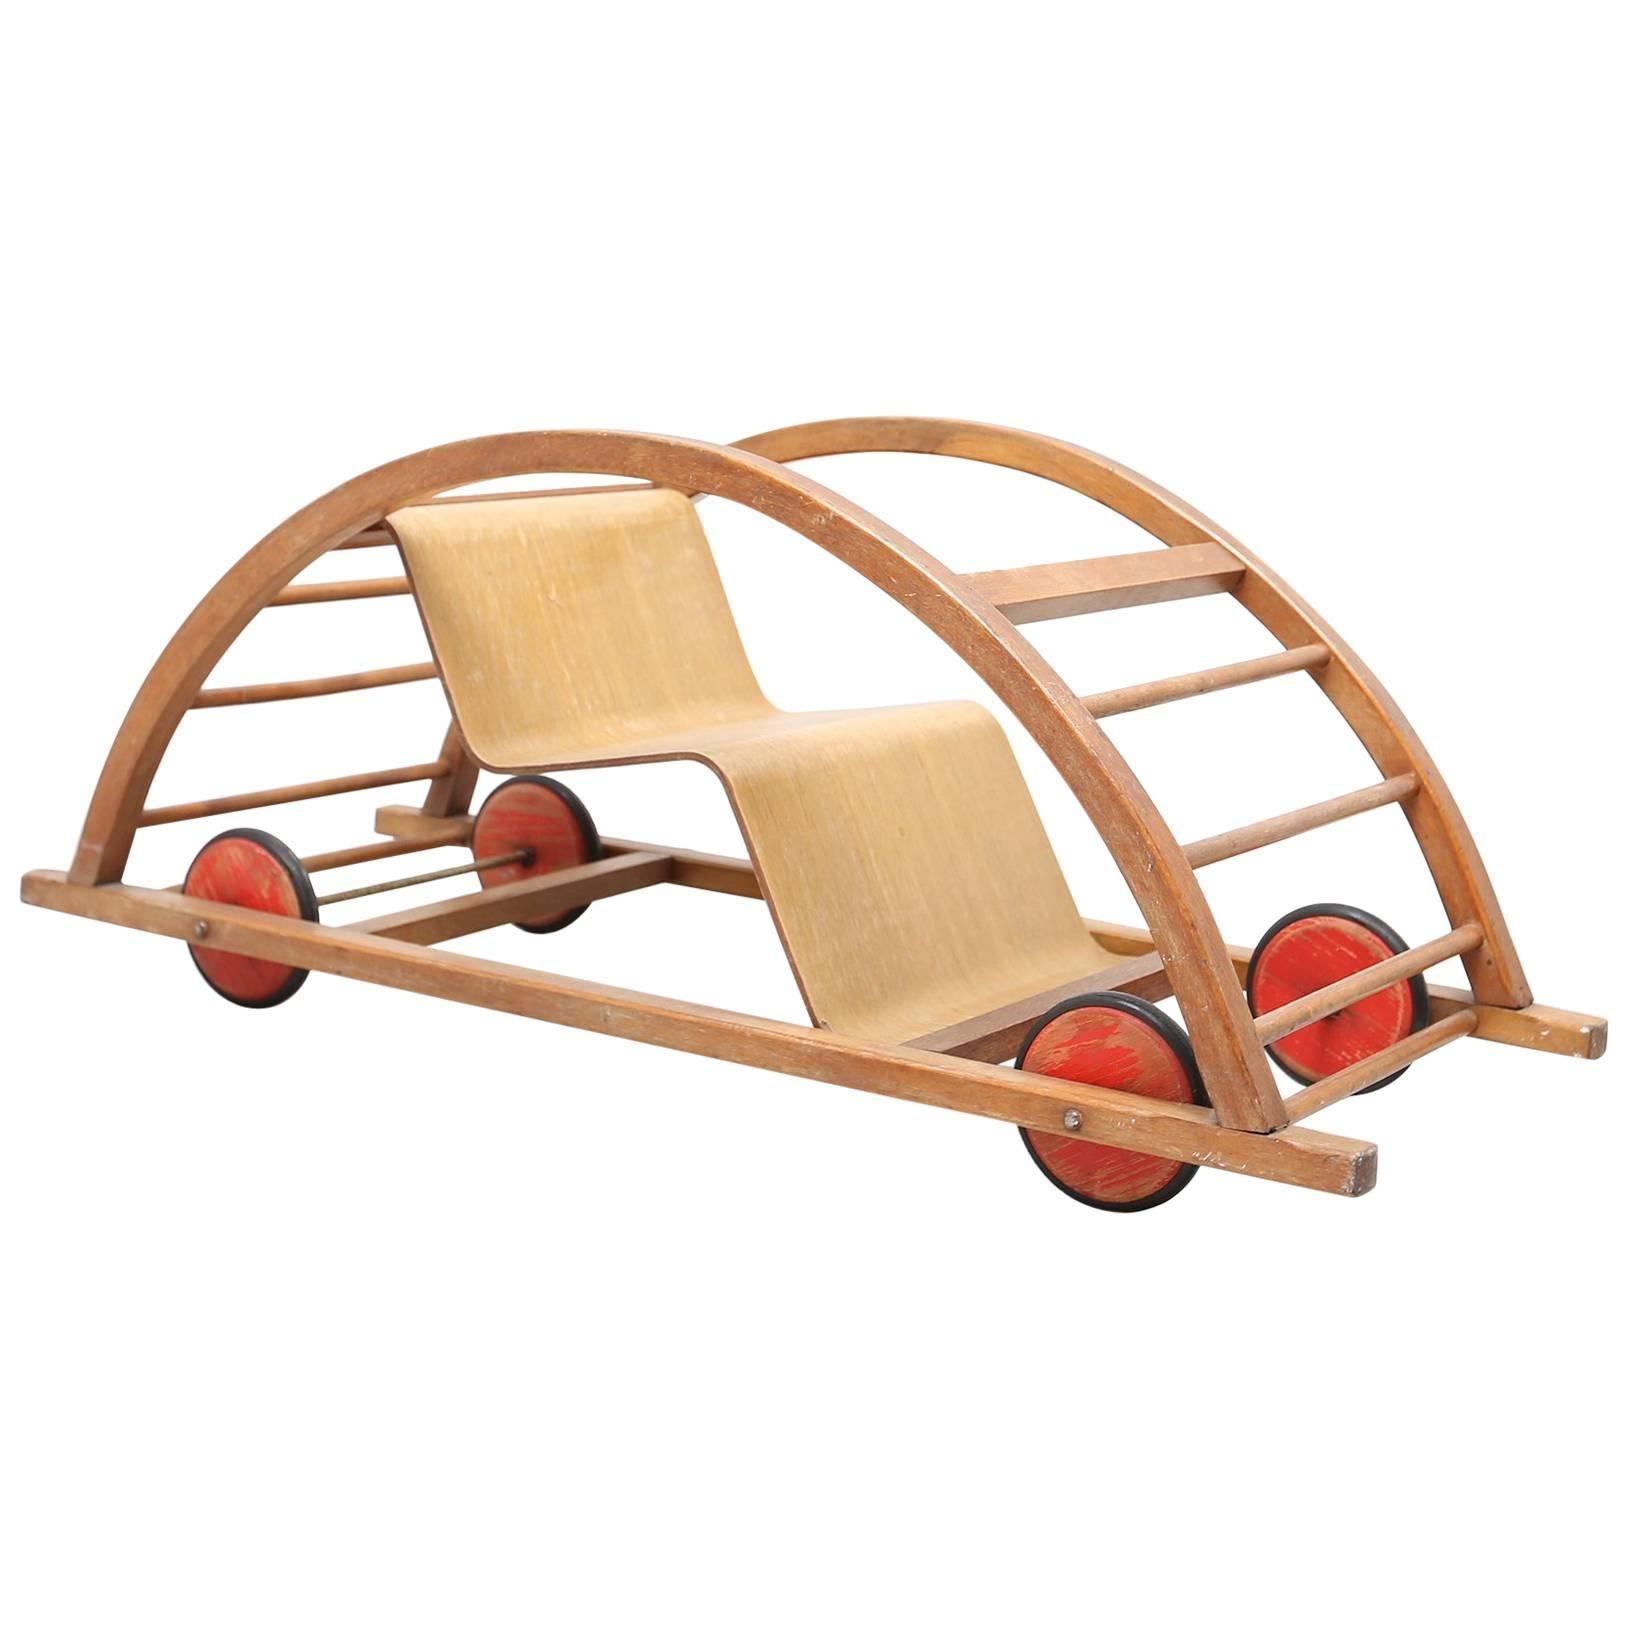 Hans Brockhage Schaukelwagen Swing and Race Car Toy